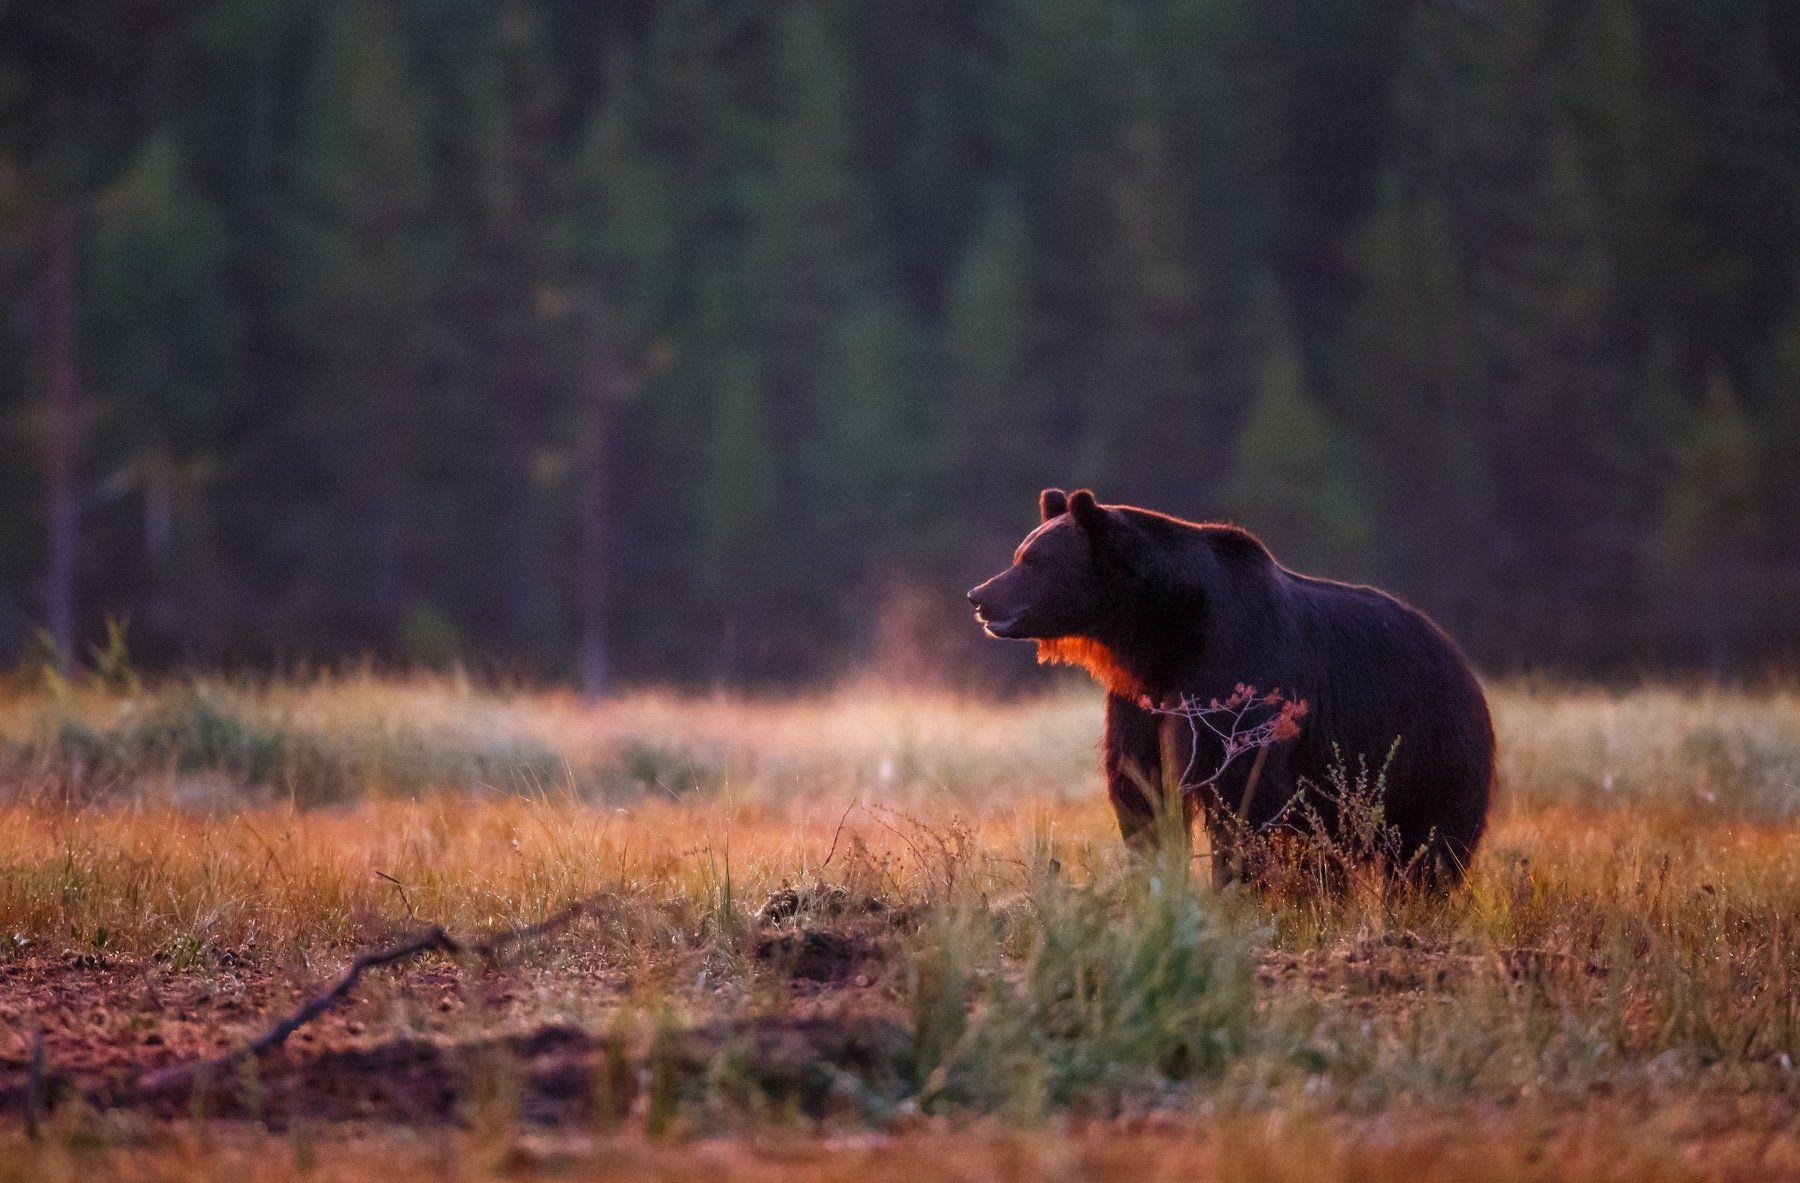 Free Black Bear Wallpapers Wallpaper 1600 1200 Bear Wallpaper 50 Wallpapers Adorable Wallpapers Bear Wallpaper Bear Pictures Bear